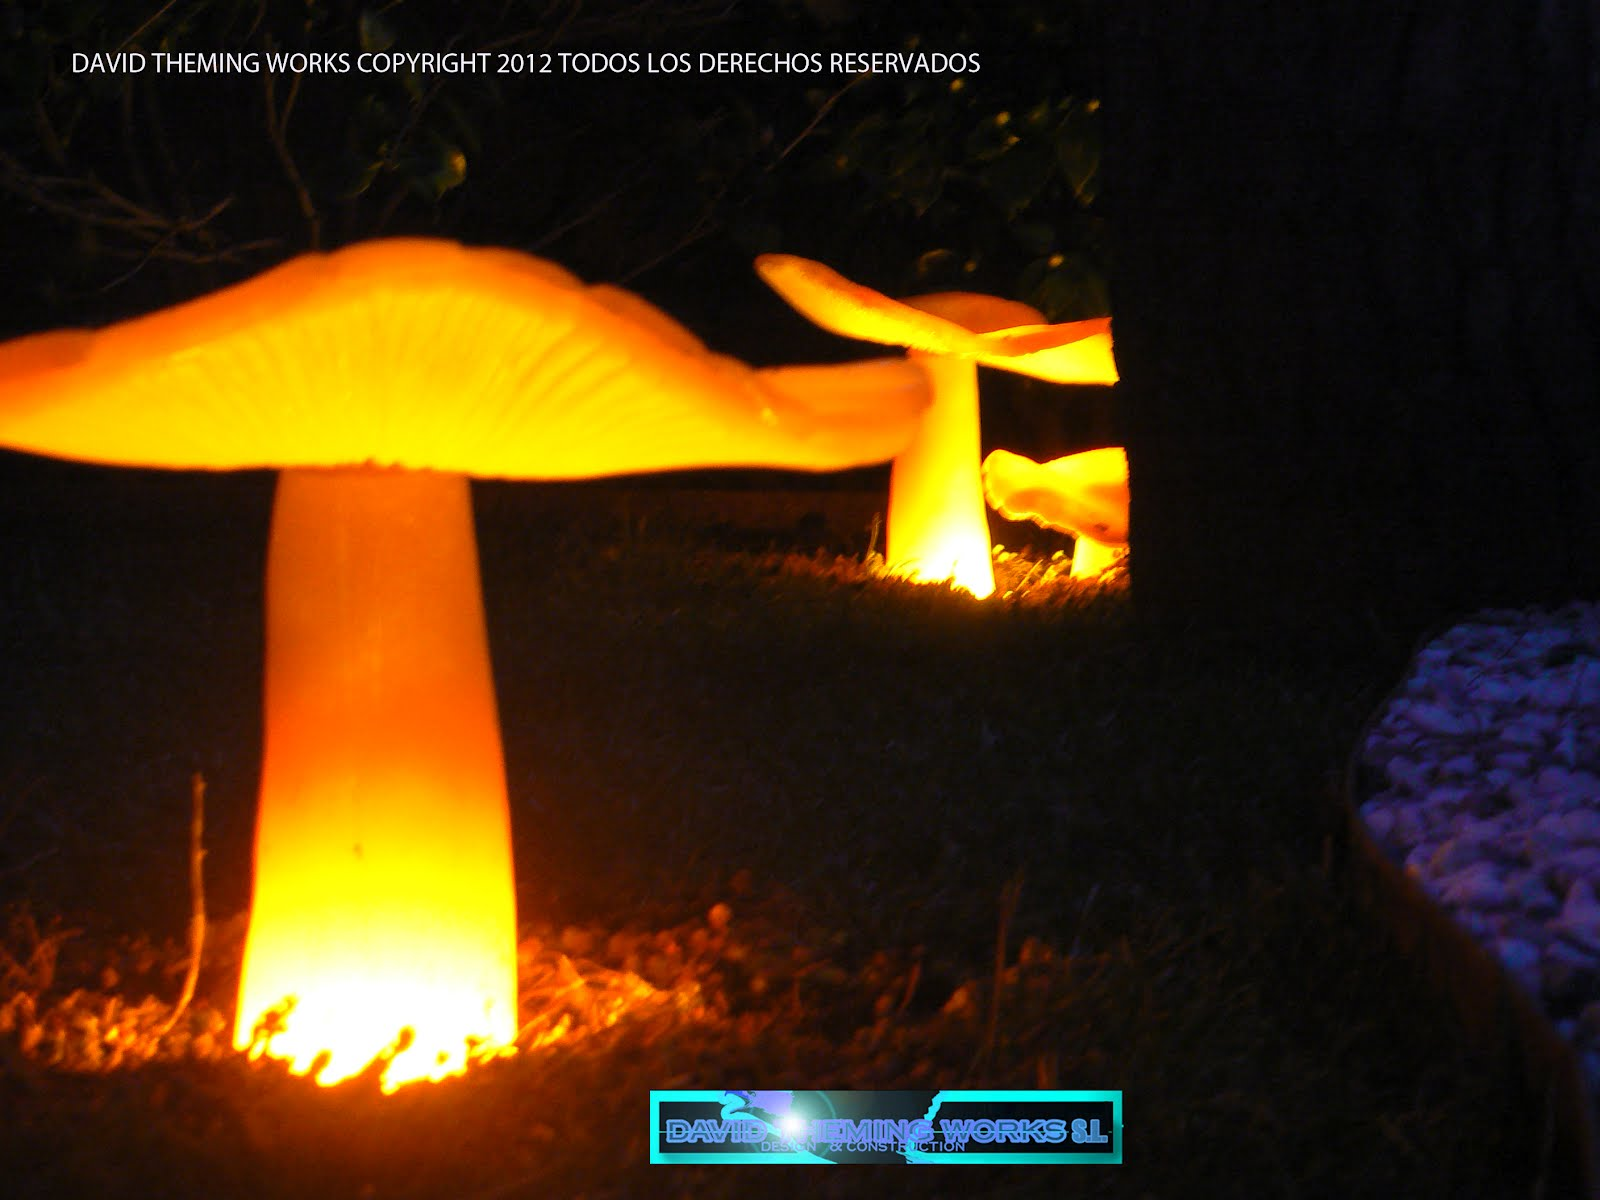 Garden lighting iluminaci n de jardines tematizacion - Iluminacion de jardin ...